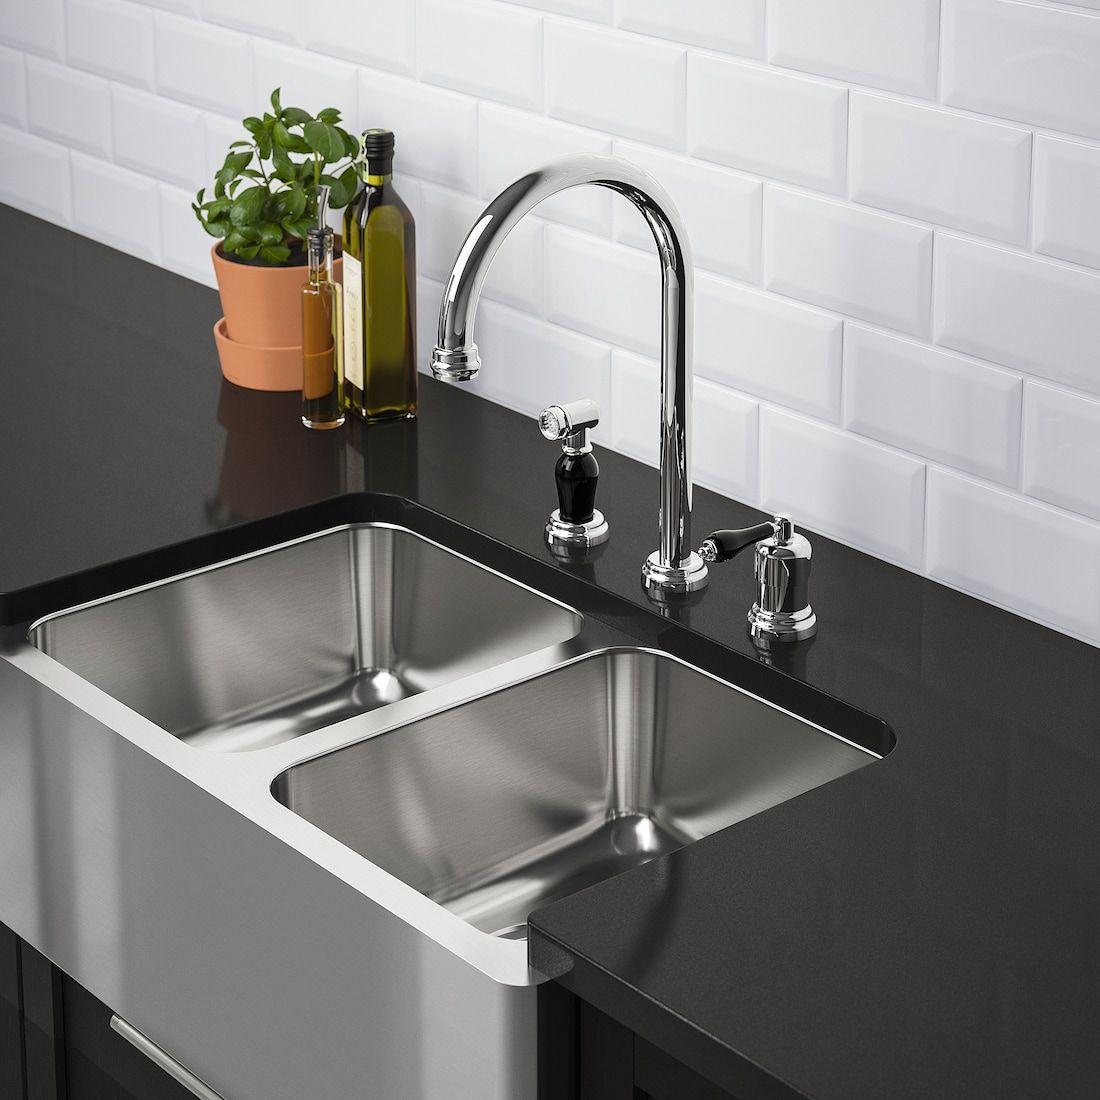 Bredsjon Apron Front Double Bowl Sink Under Glued Stainless